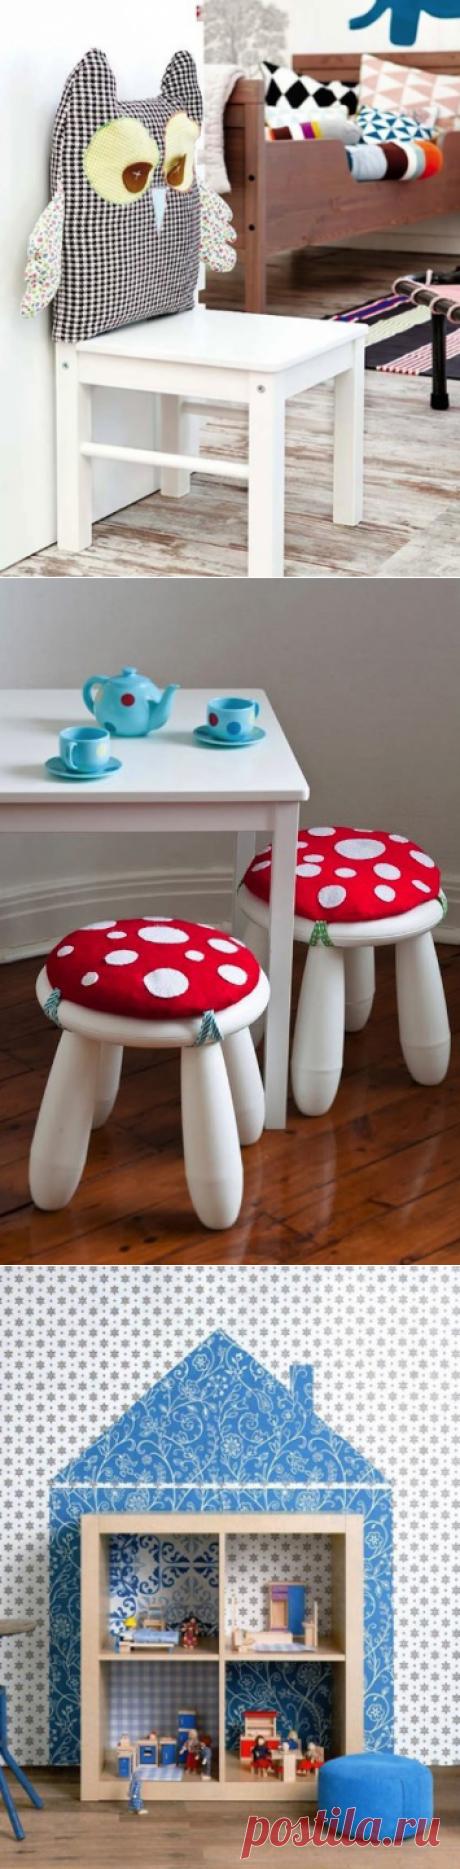 Хэндмейд идеи для детской комнаты - Домашний hand-made